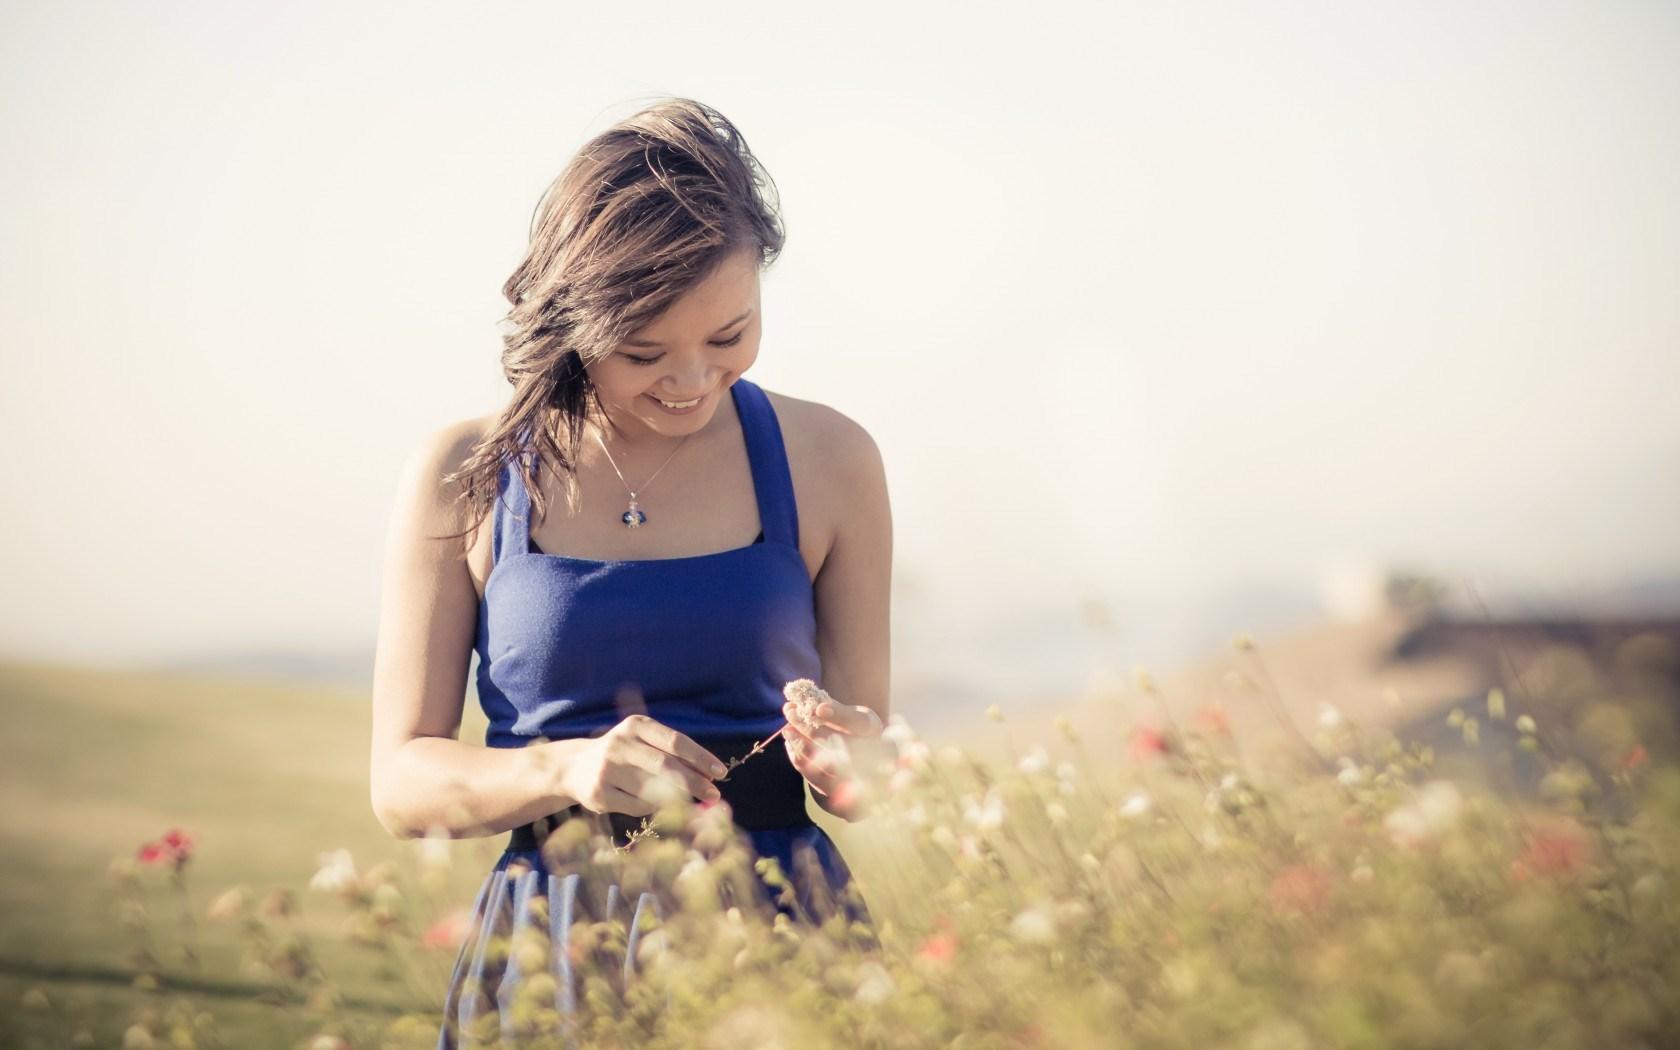 Cute Girl Hd Wallpapers 1080p Download Mood Girl Blue Dress Smile Field Wallpaper Celebrities